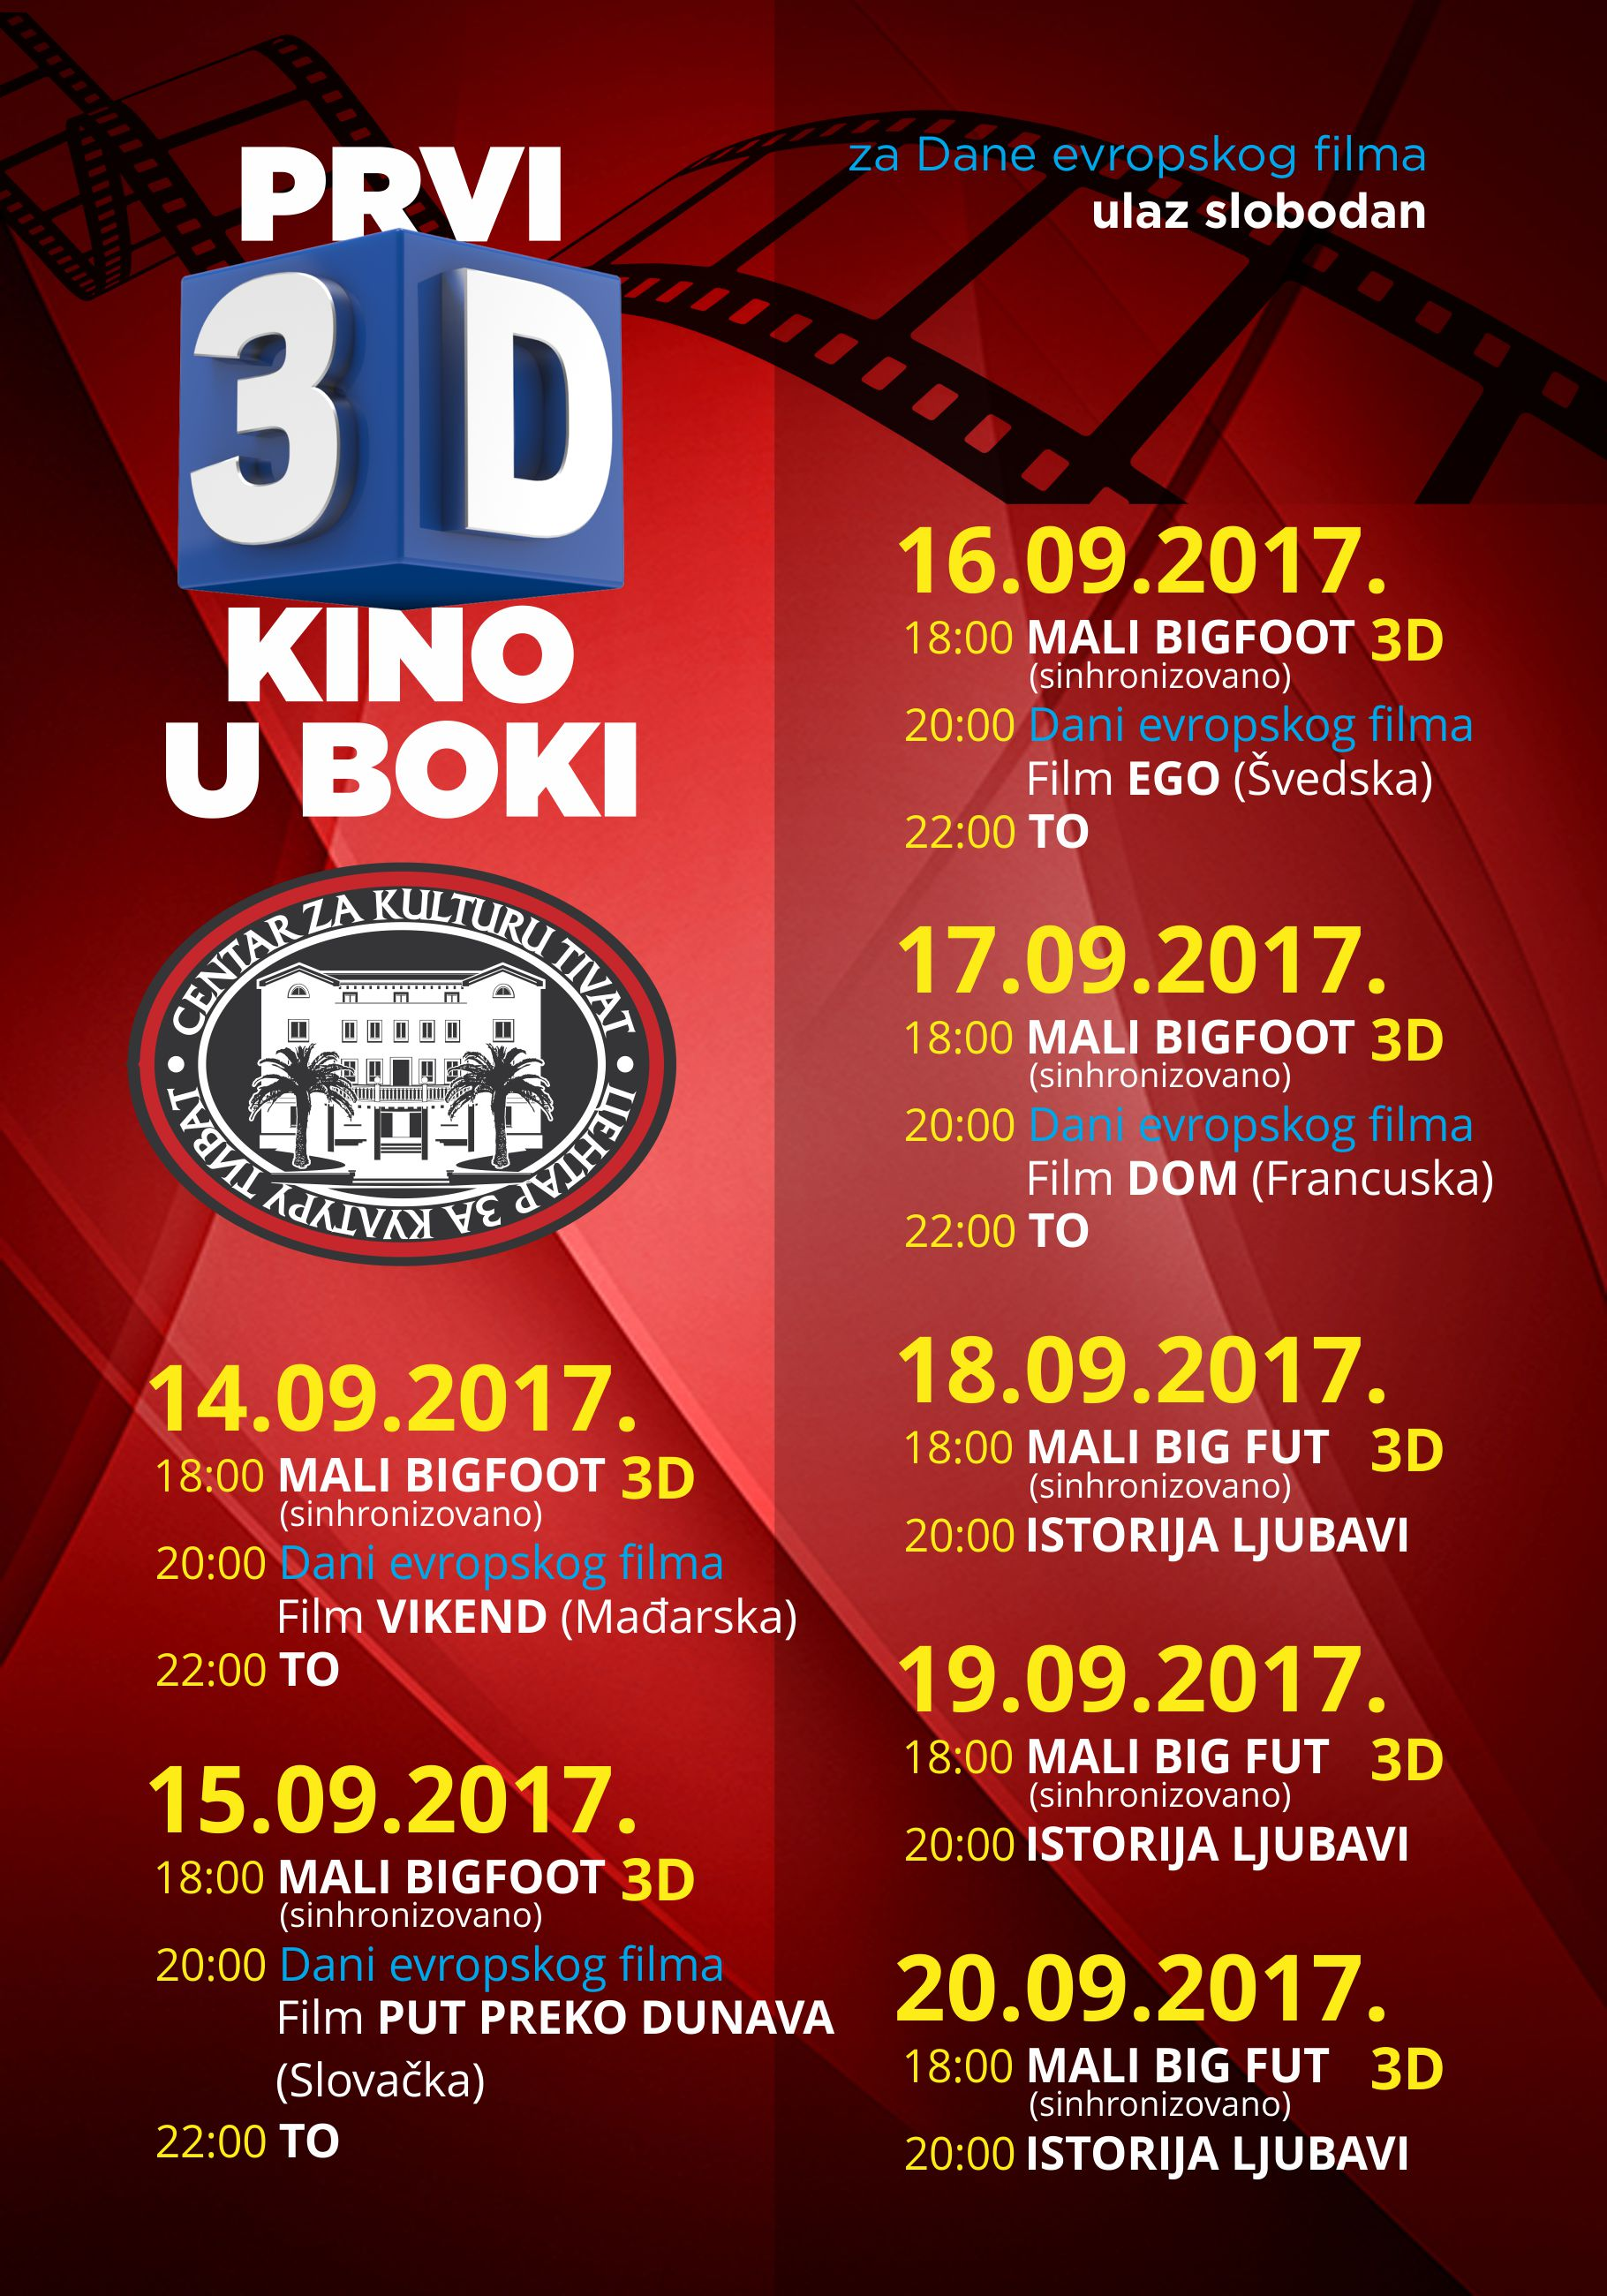 kino-repertoar-12